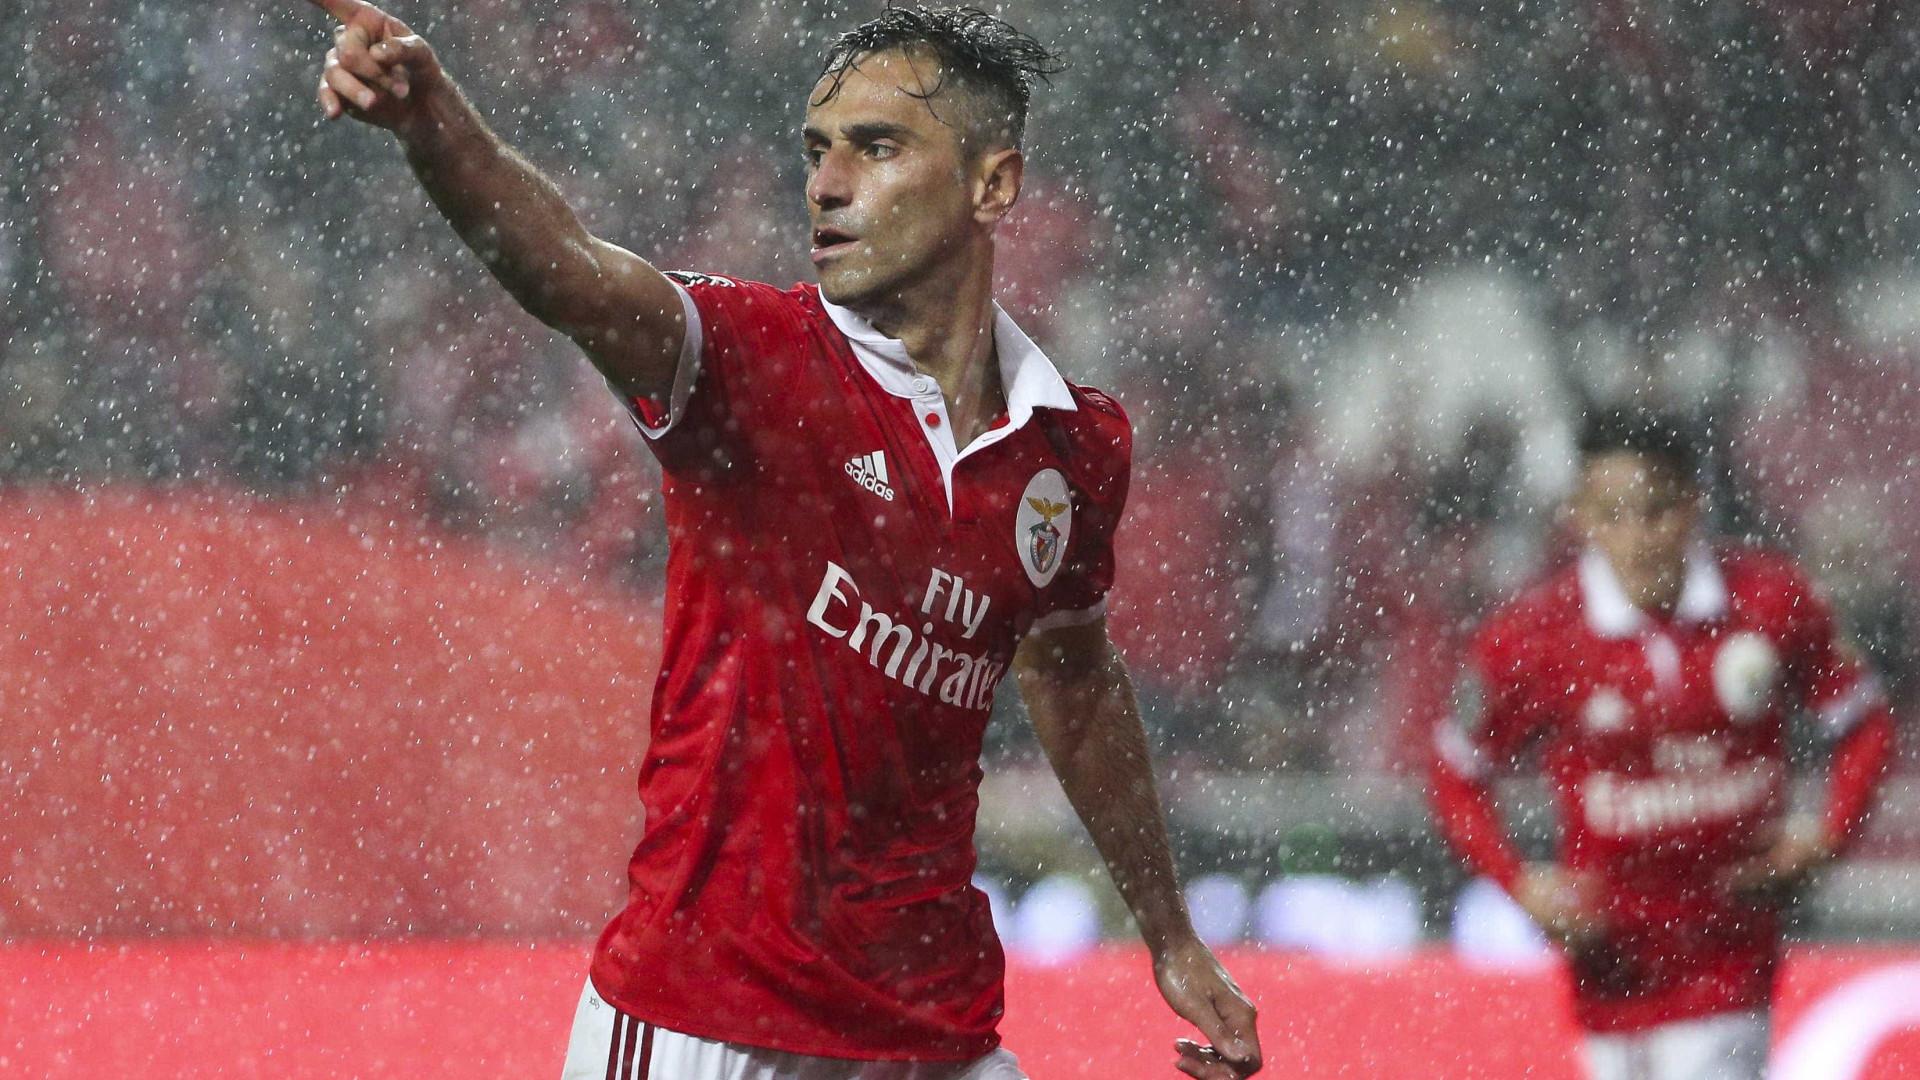 Vieira propõe aumento a Jonas, mas recusa igualar proposta árabe